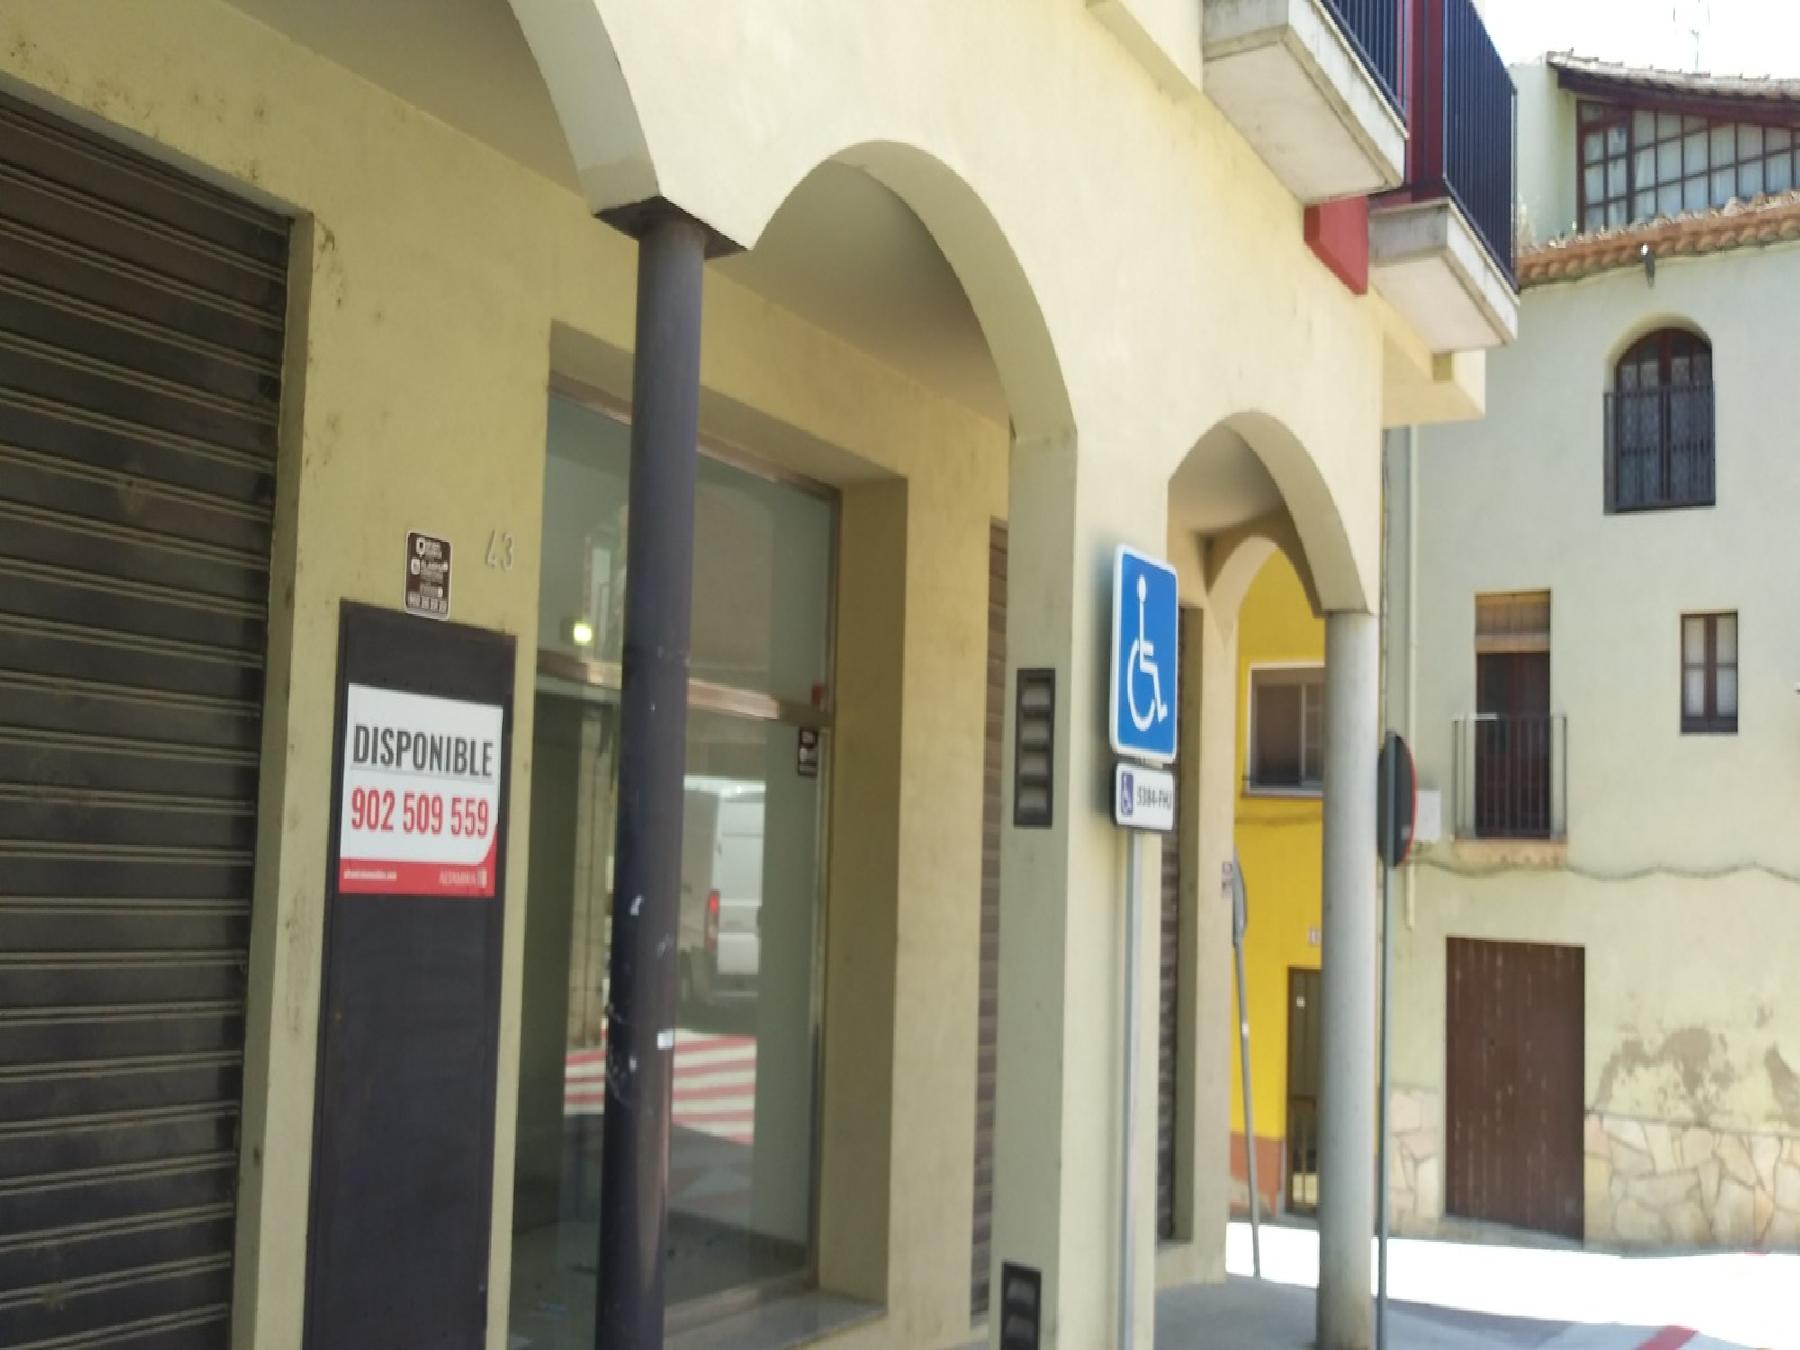 Locale commerciale in Sant Quintí de Mediona